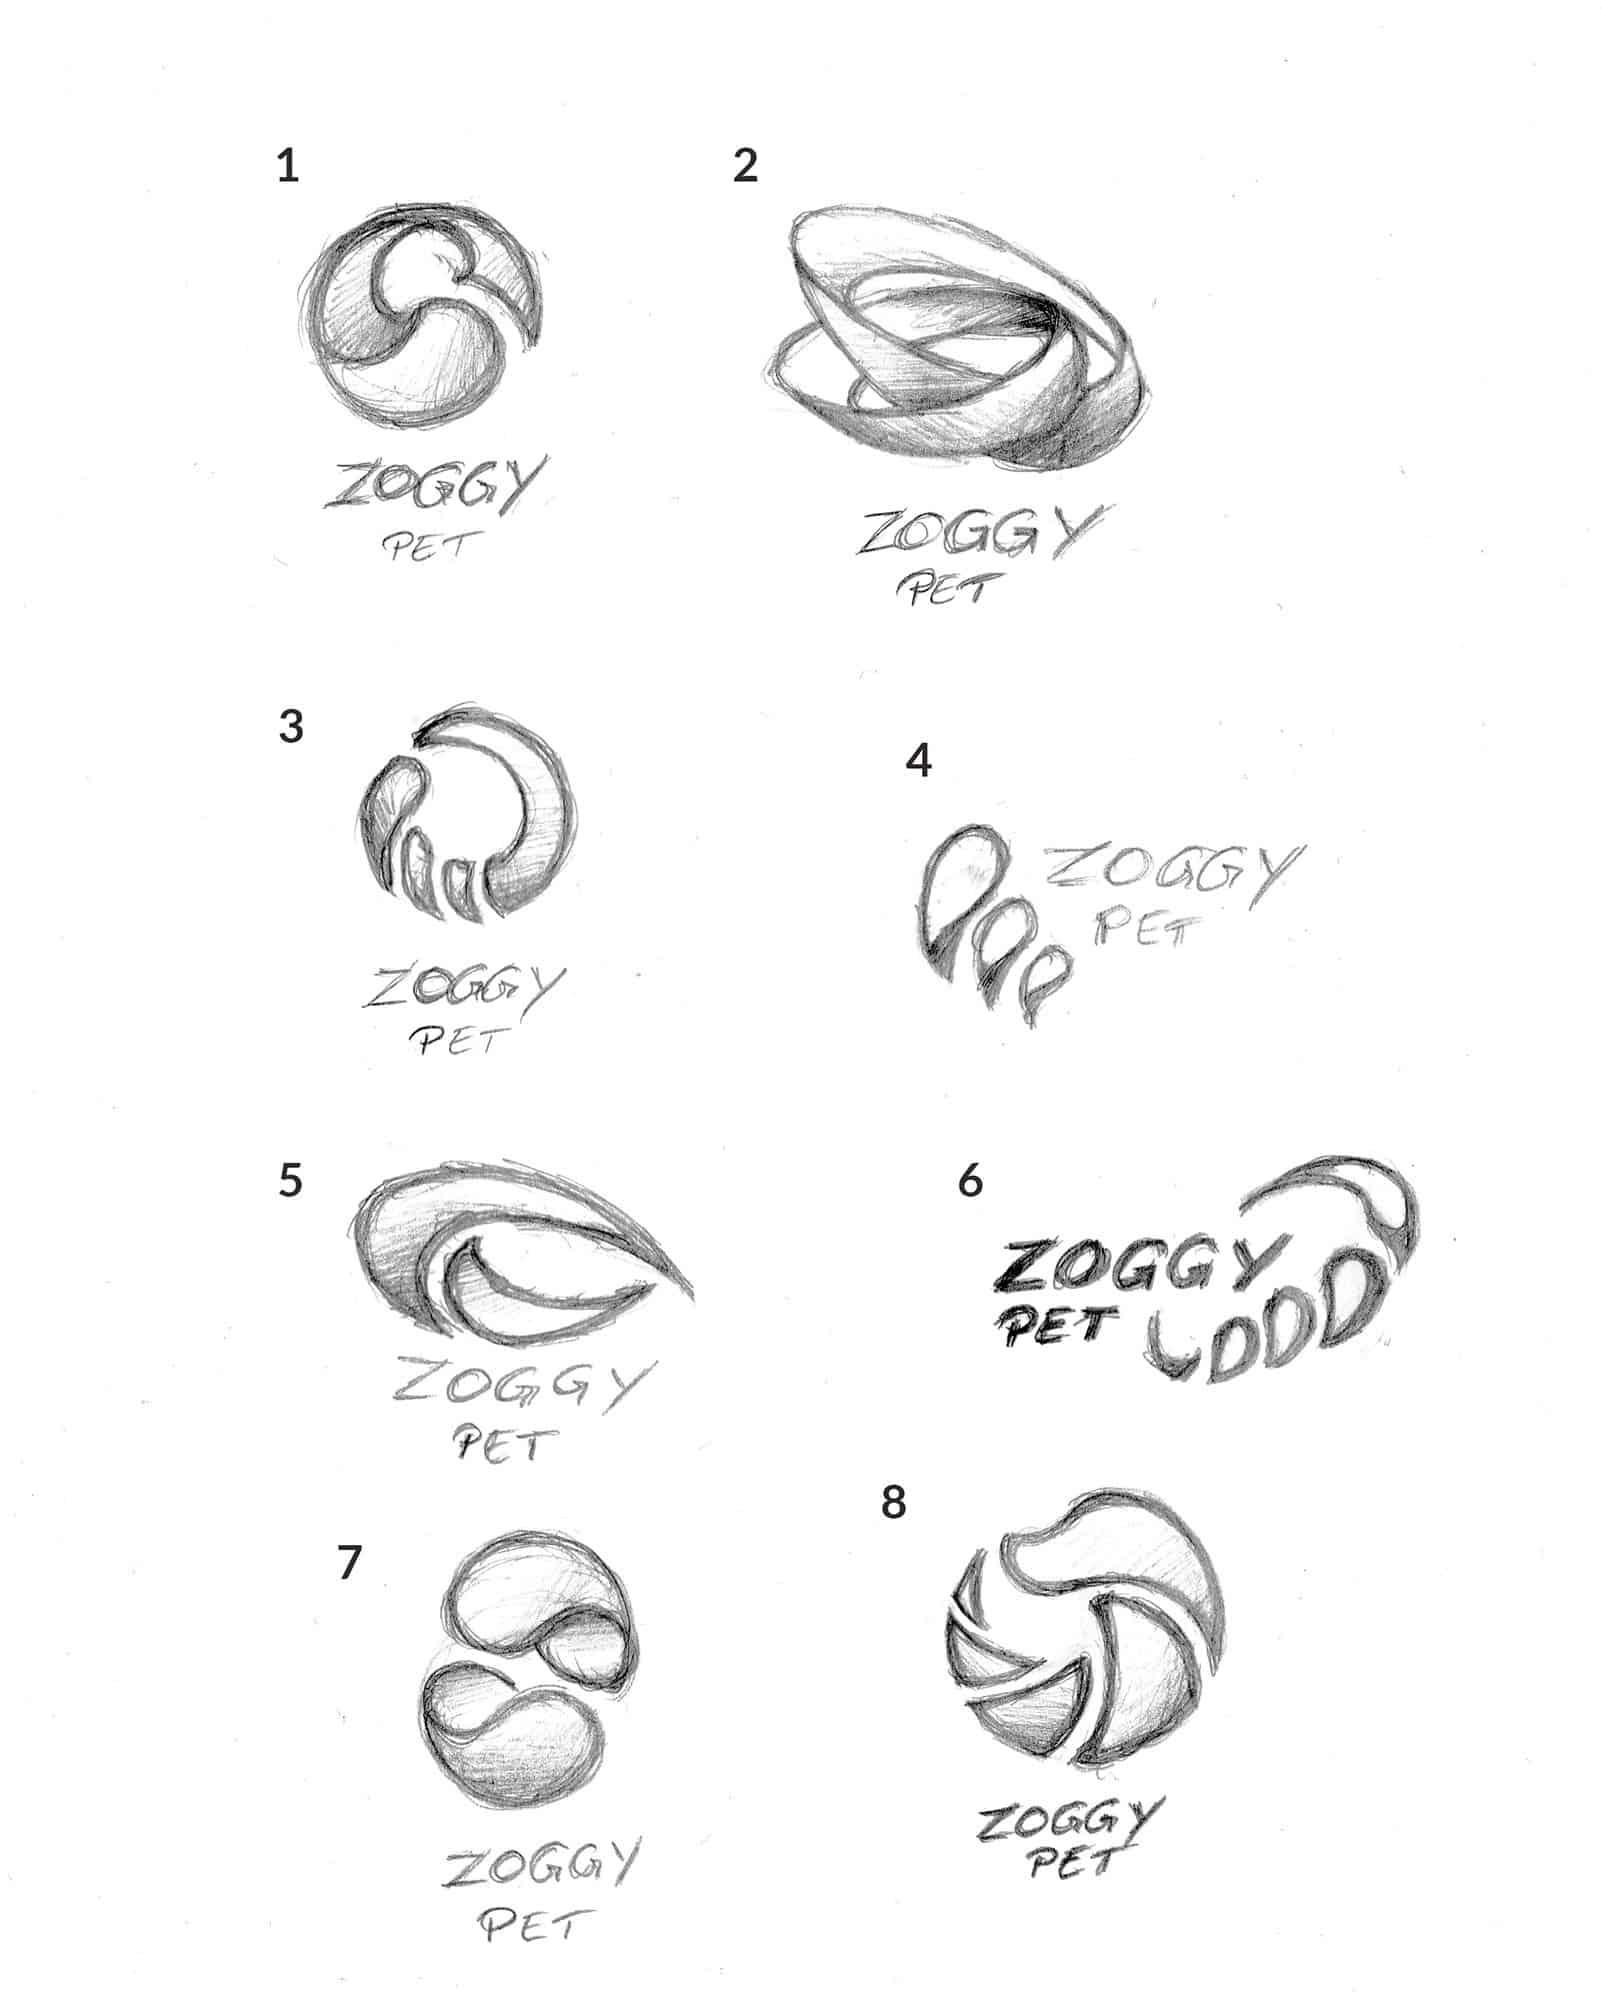 Zoggy Logo Design grobe Skizzen